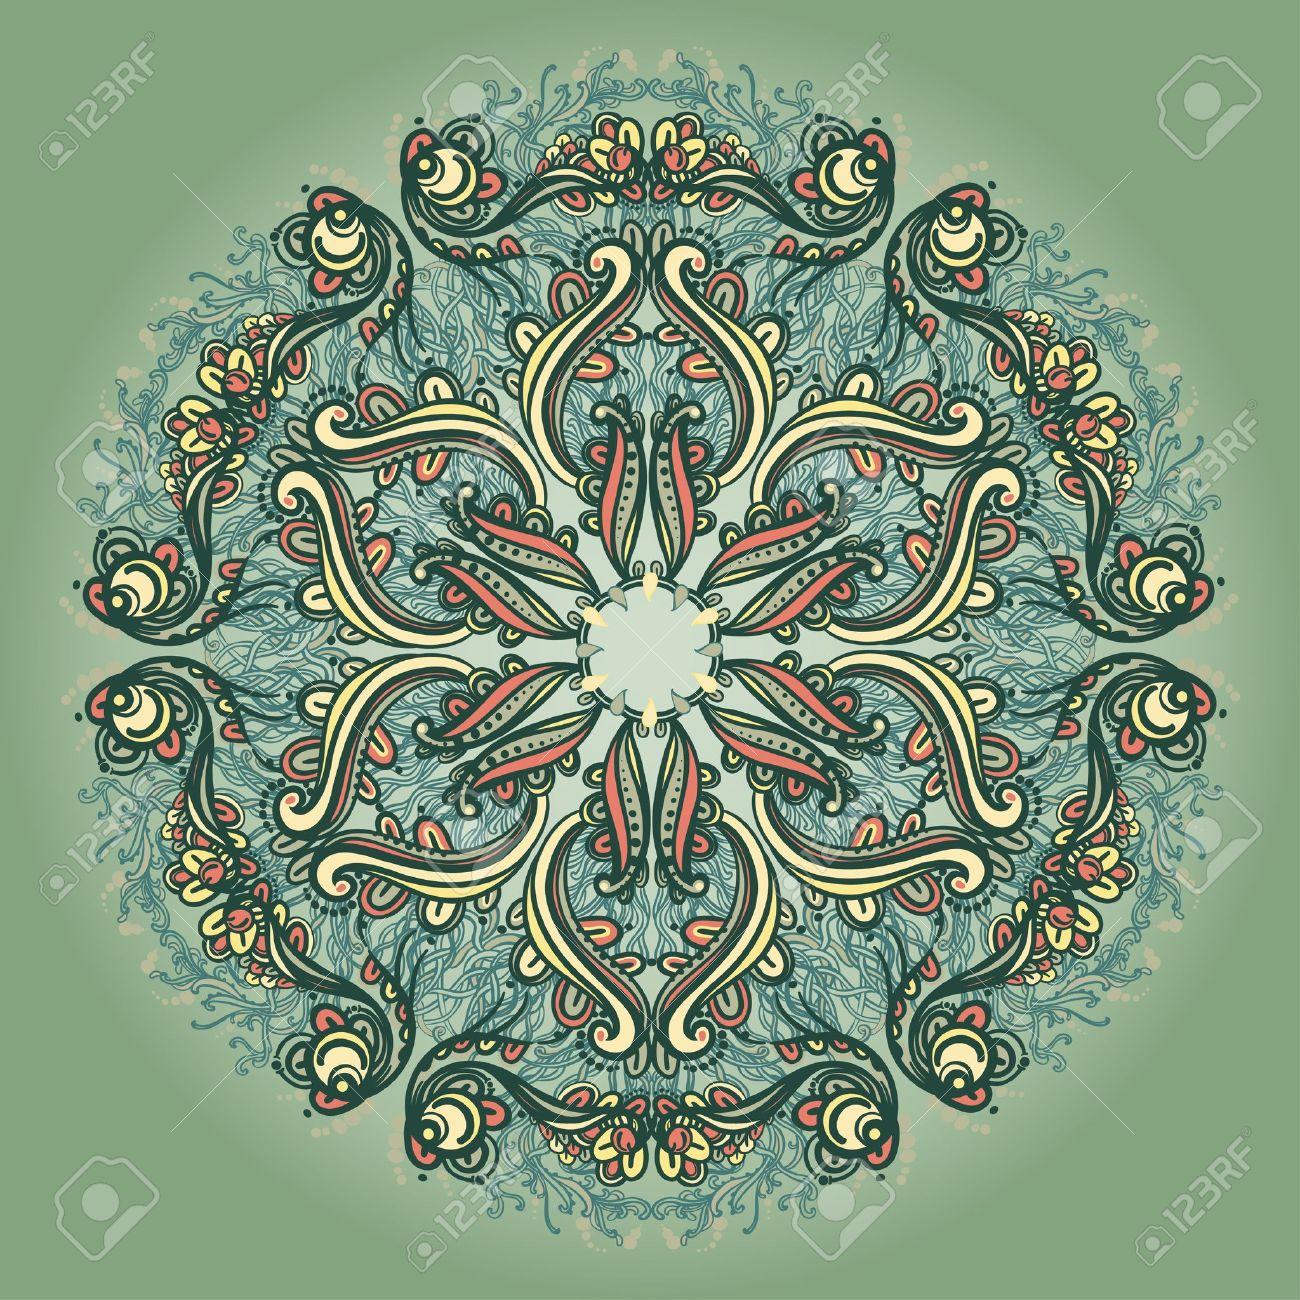 Ornamental round floral lace pattern kaleidoscopic floral pattern, mandala - 14315521